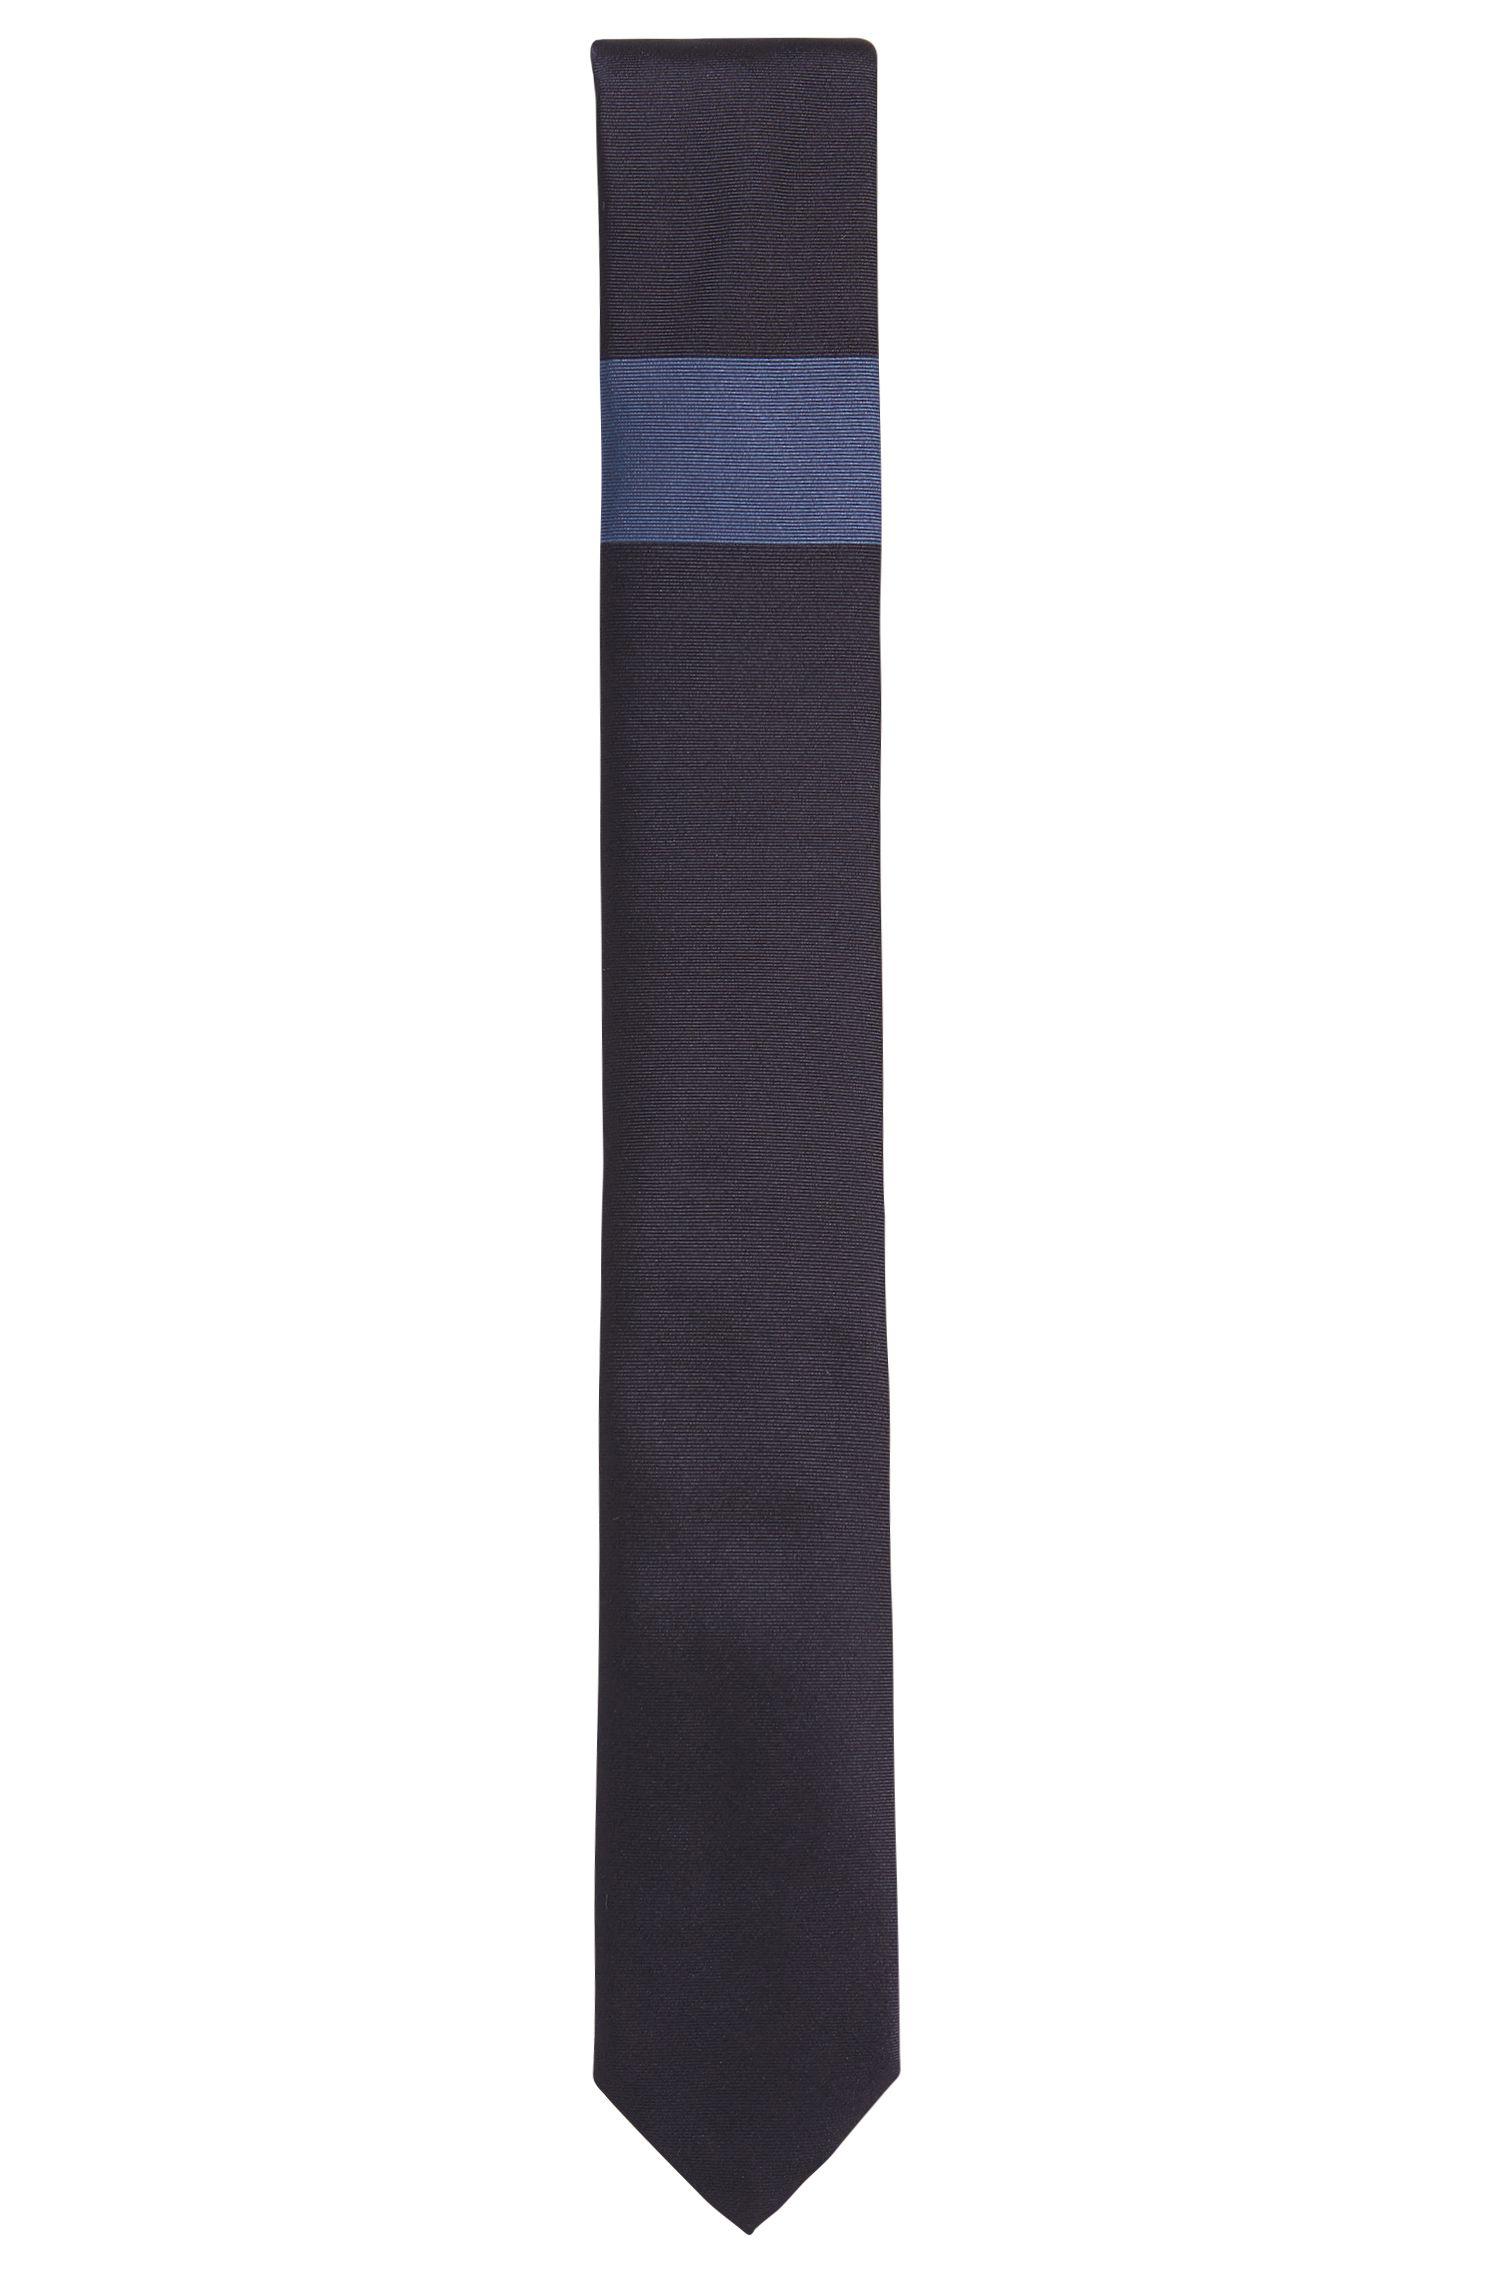 'Tie 6 cm' | Slim, Colorblocked Silk Tie